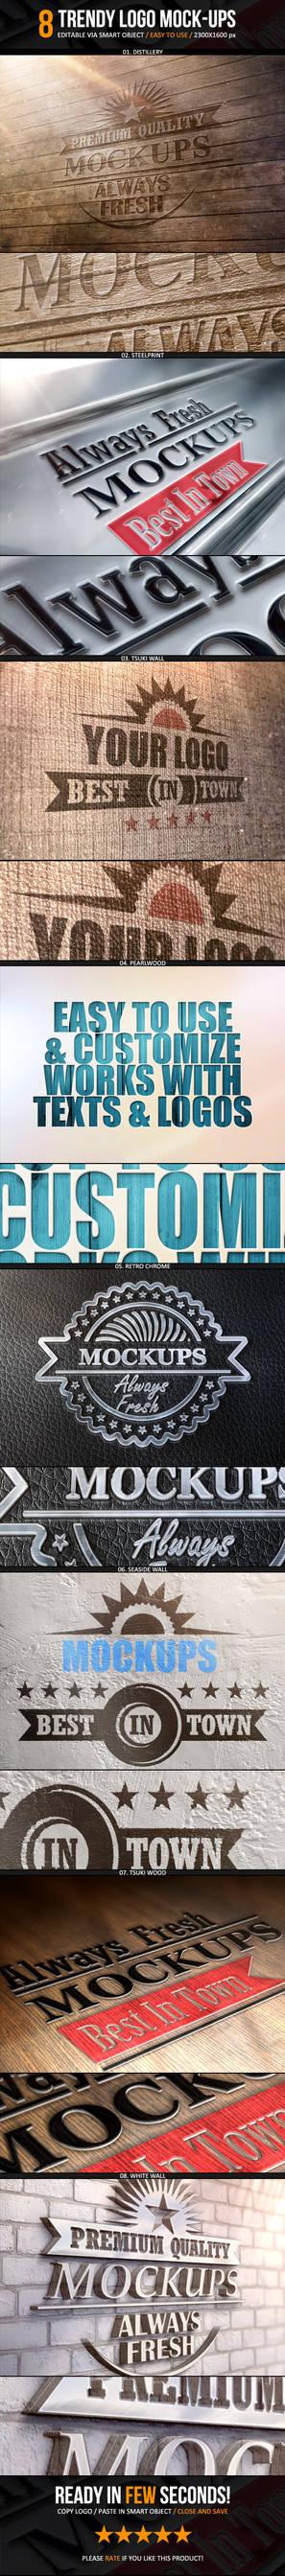 Trendy Logo Mockups - 8 Smart Templates